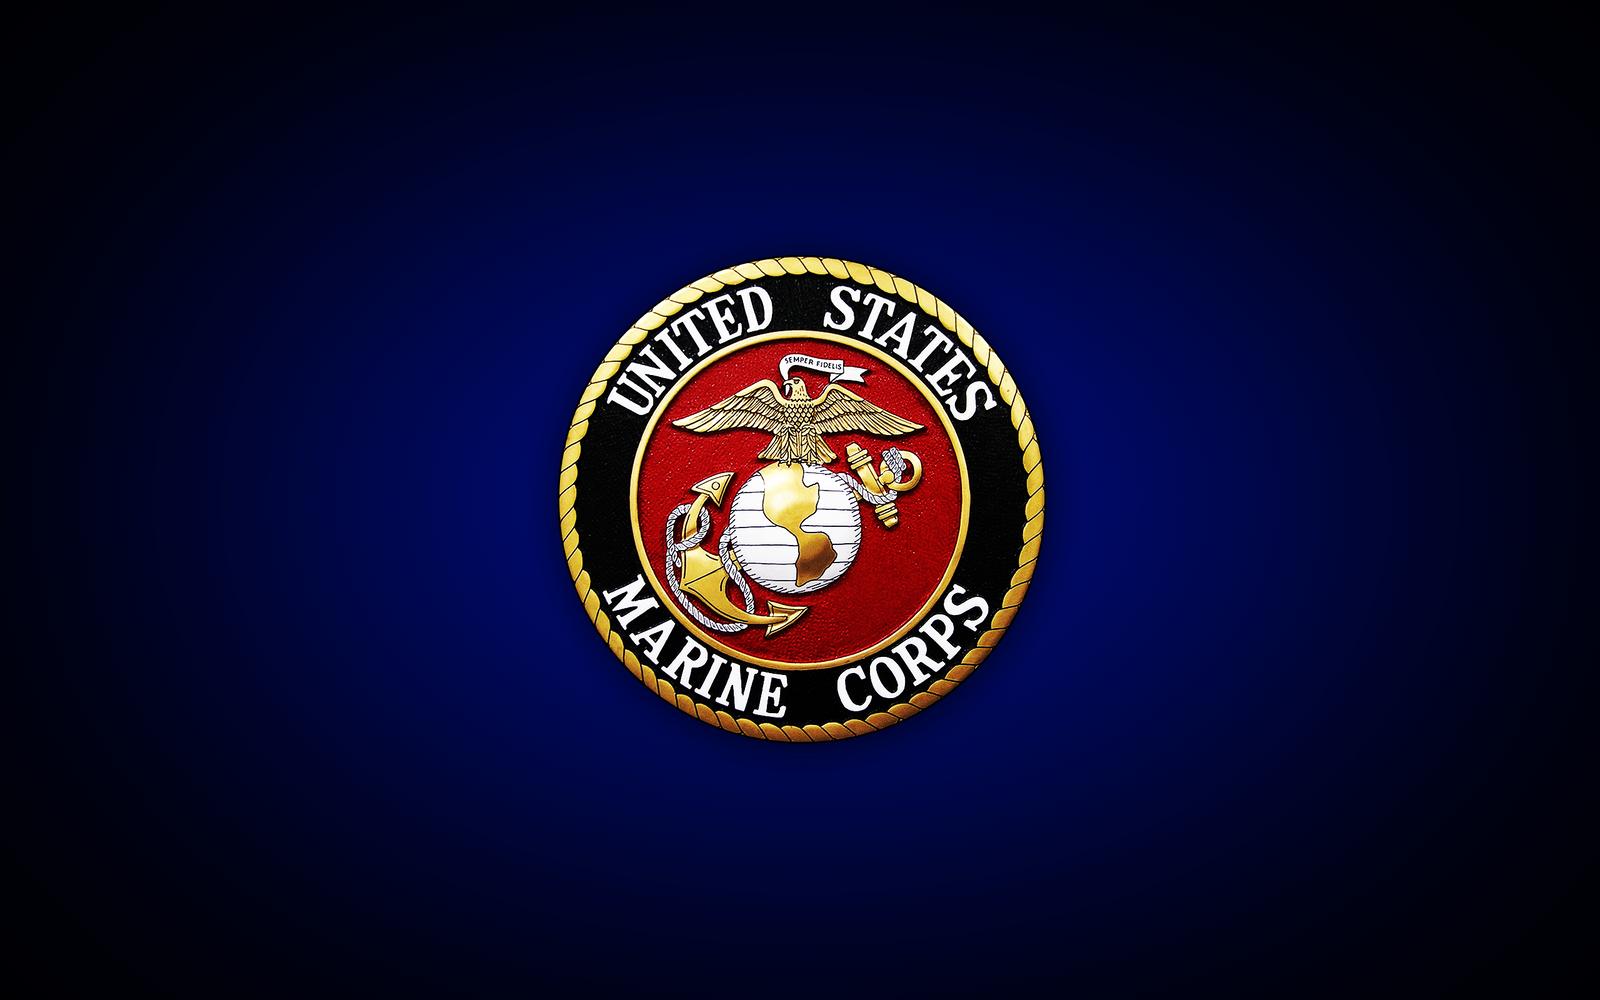 usmc united states marine corps wallpaper by